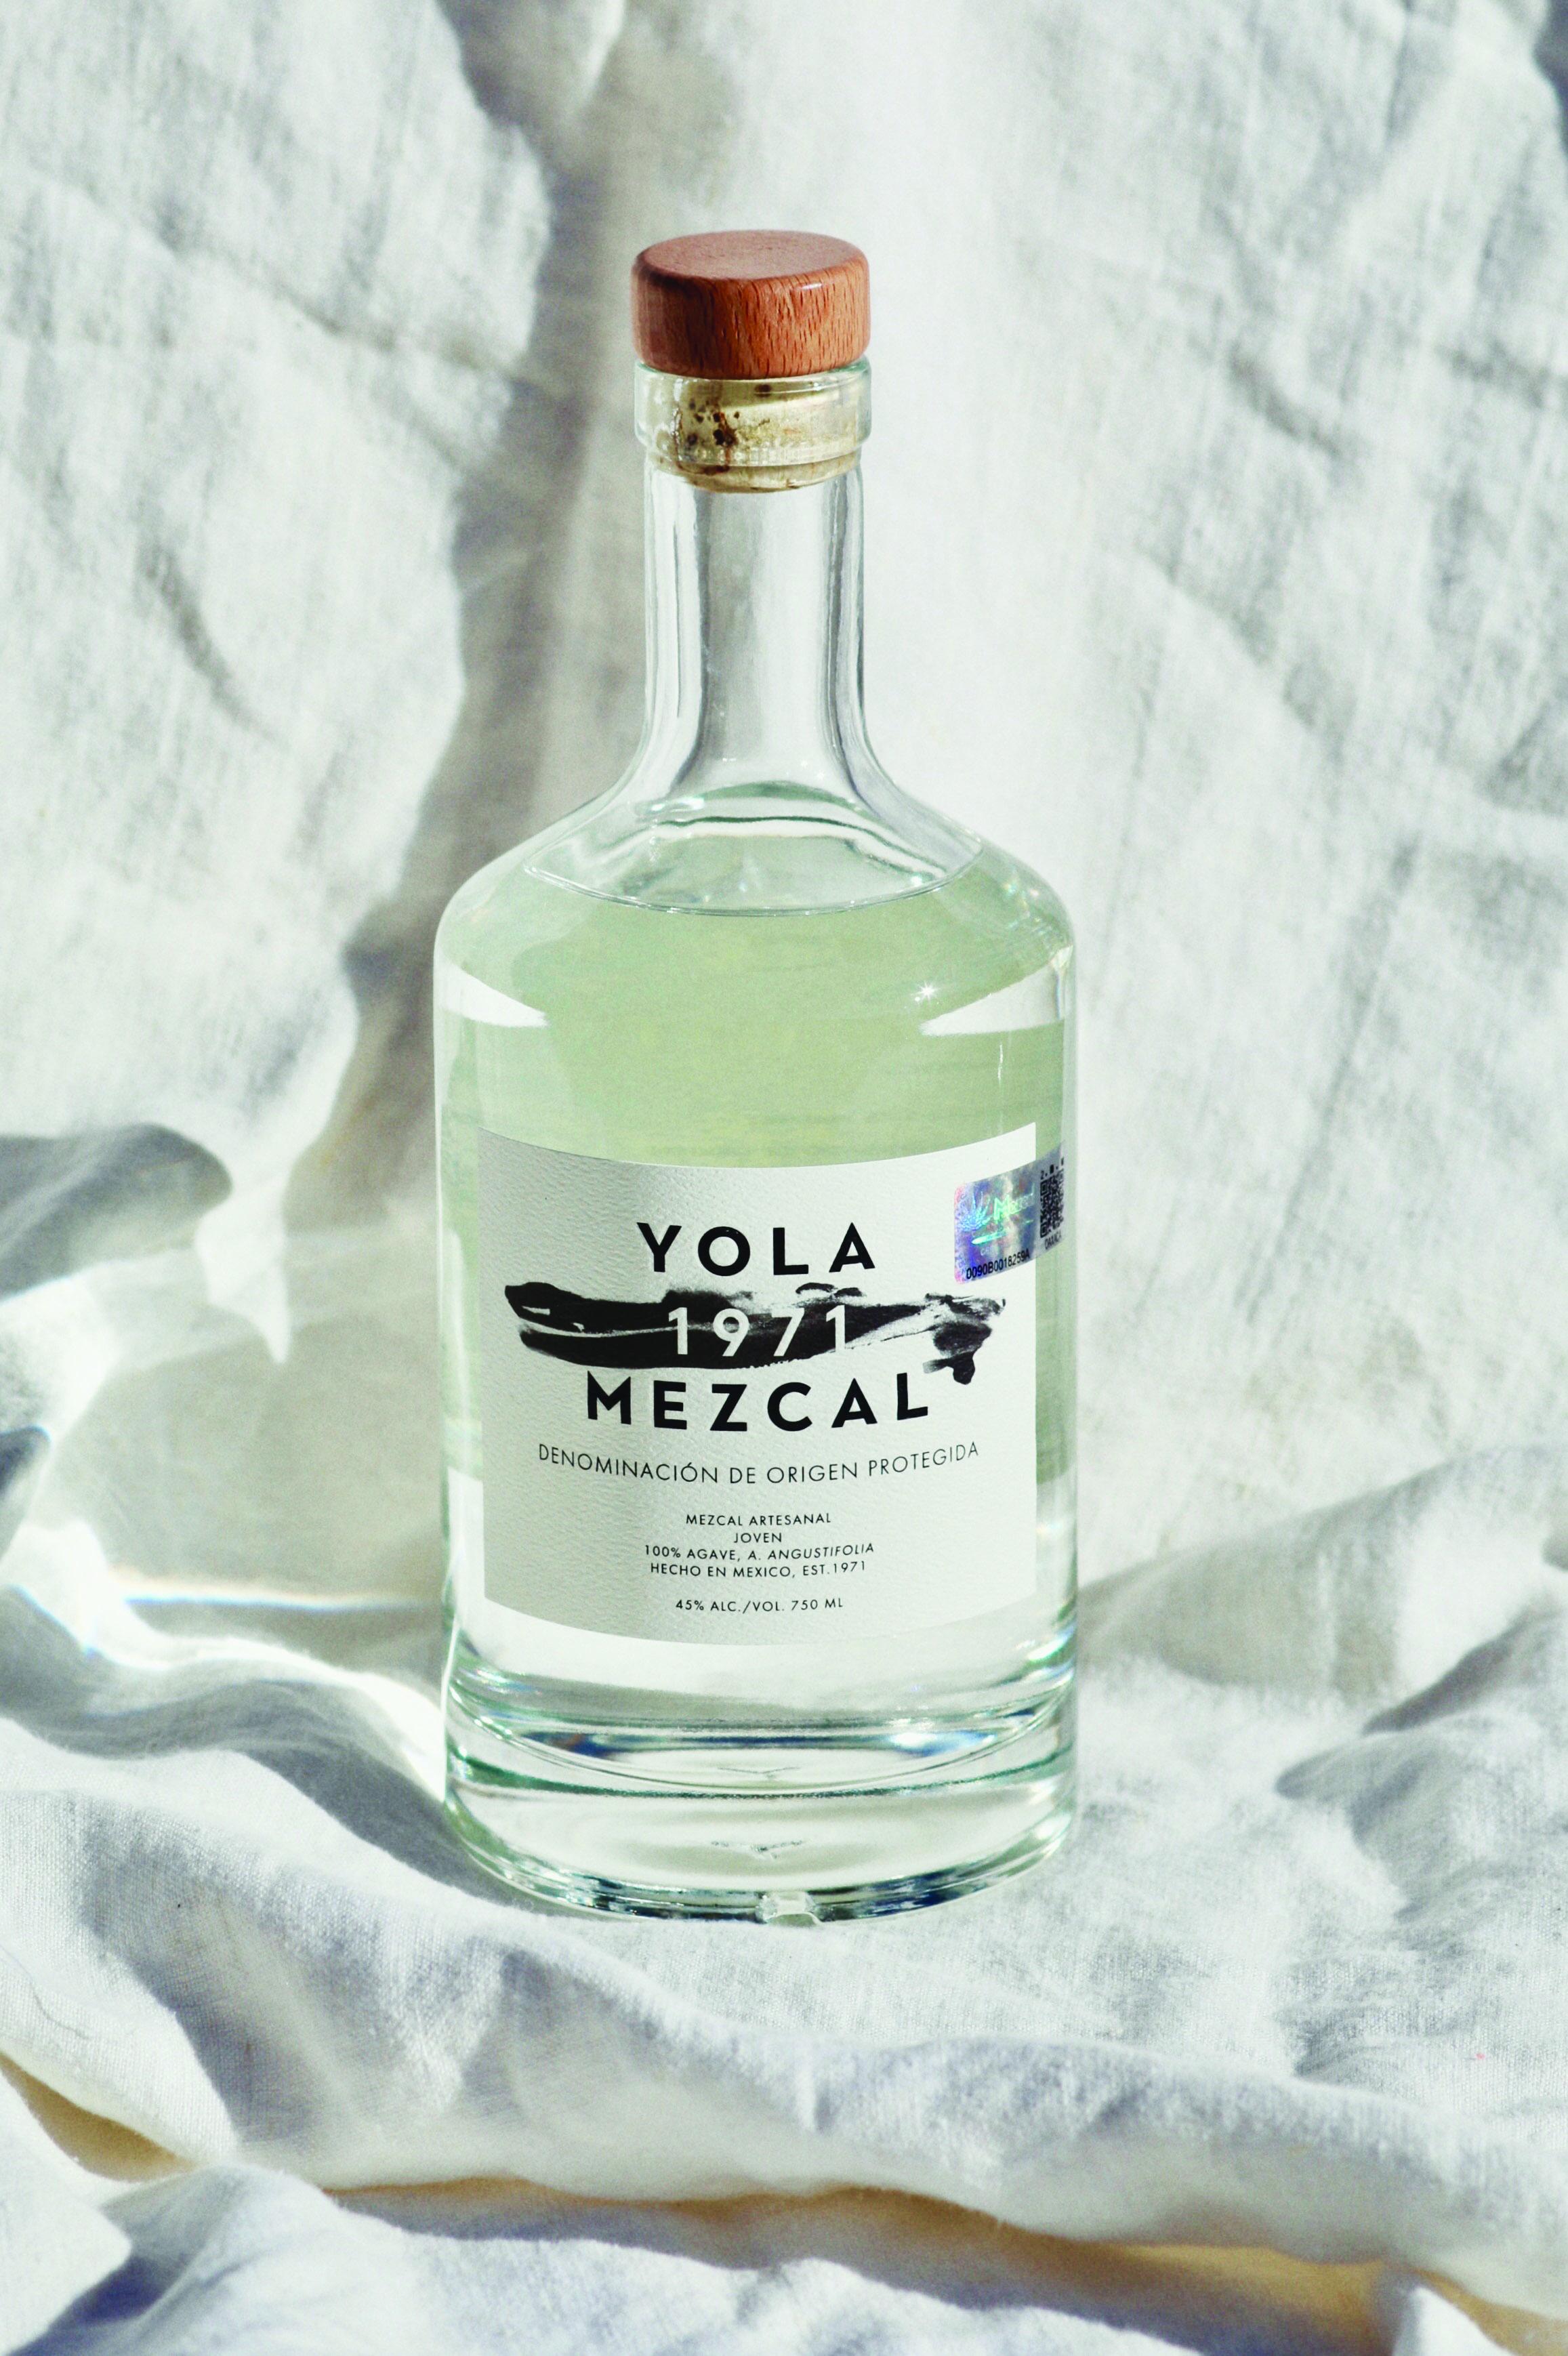 yola mezcal - gina correll aglietti, co-founder